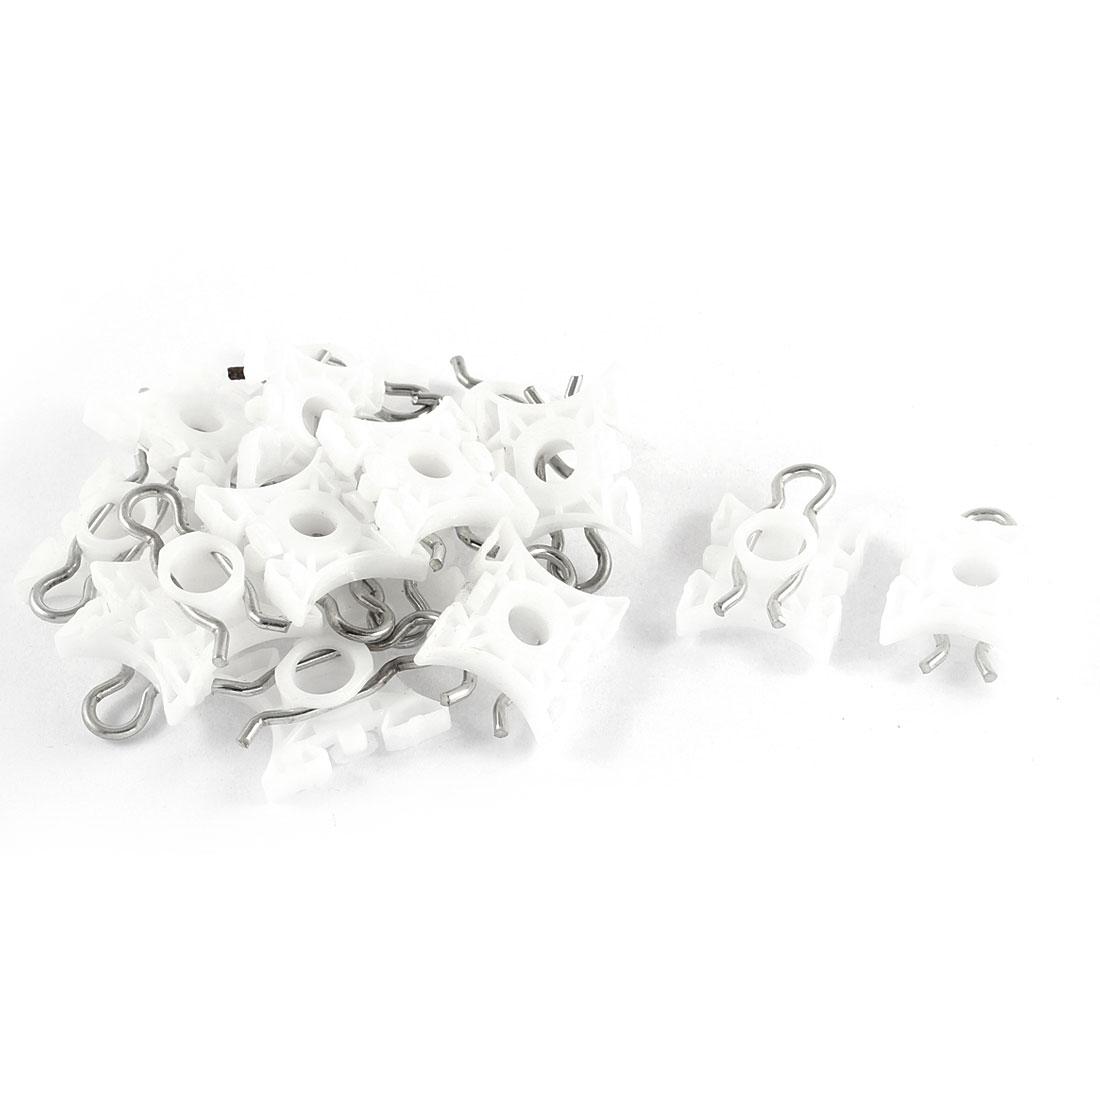 15 Pcs White 8.5mm Hole Window Fender Plastic Clips Rivet Fasteners for Volvo